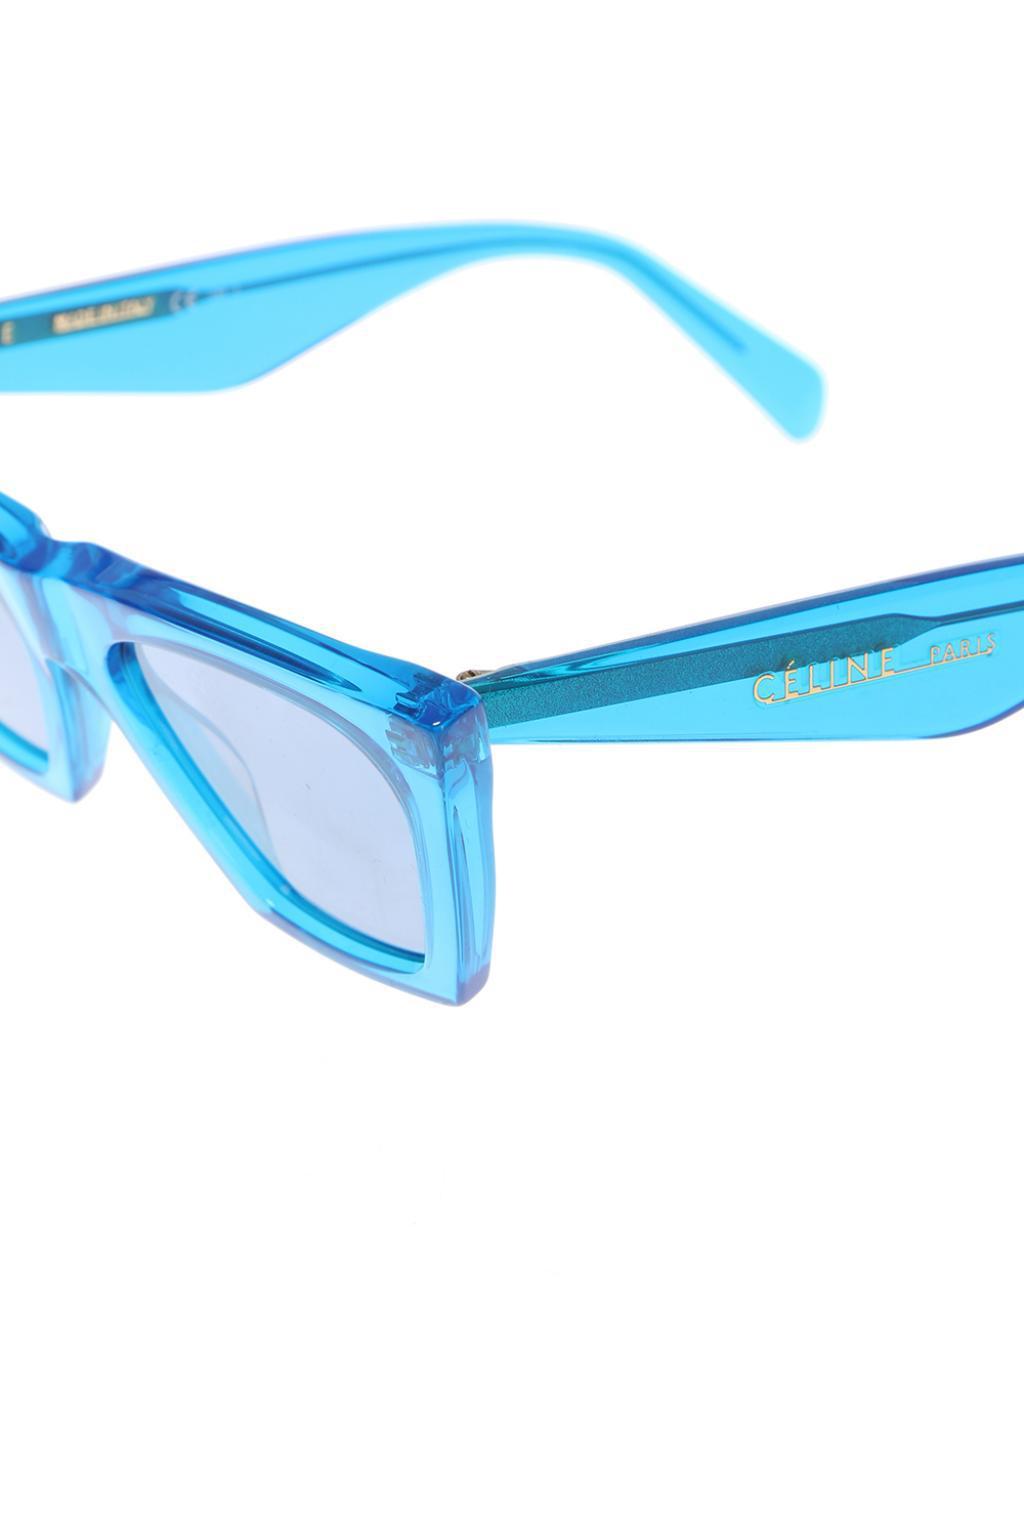 Celine 'edge' Sunglasses in Blue